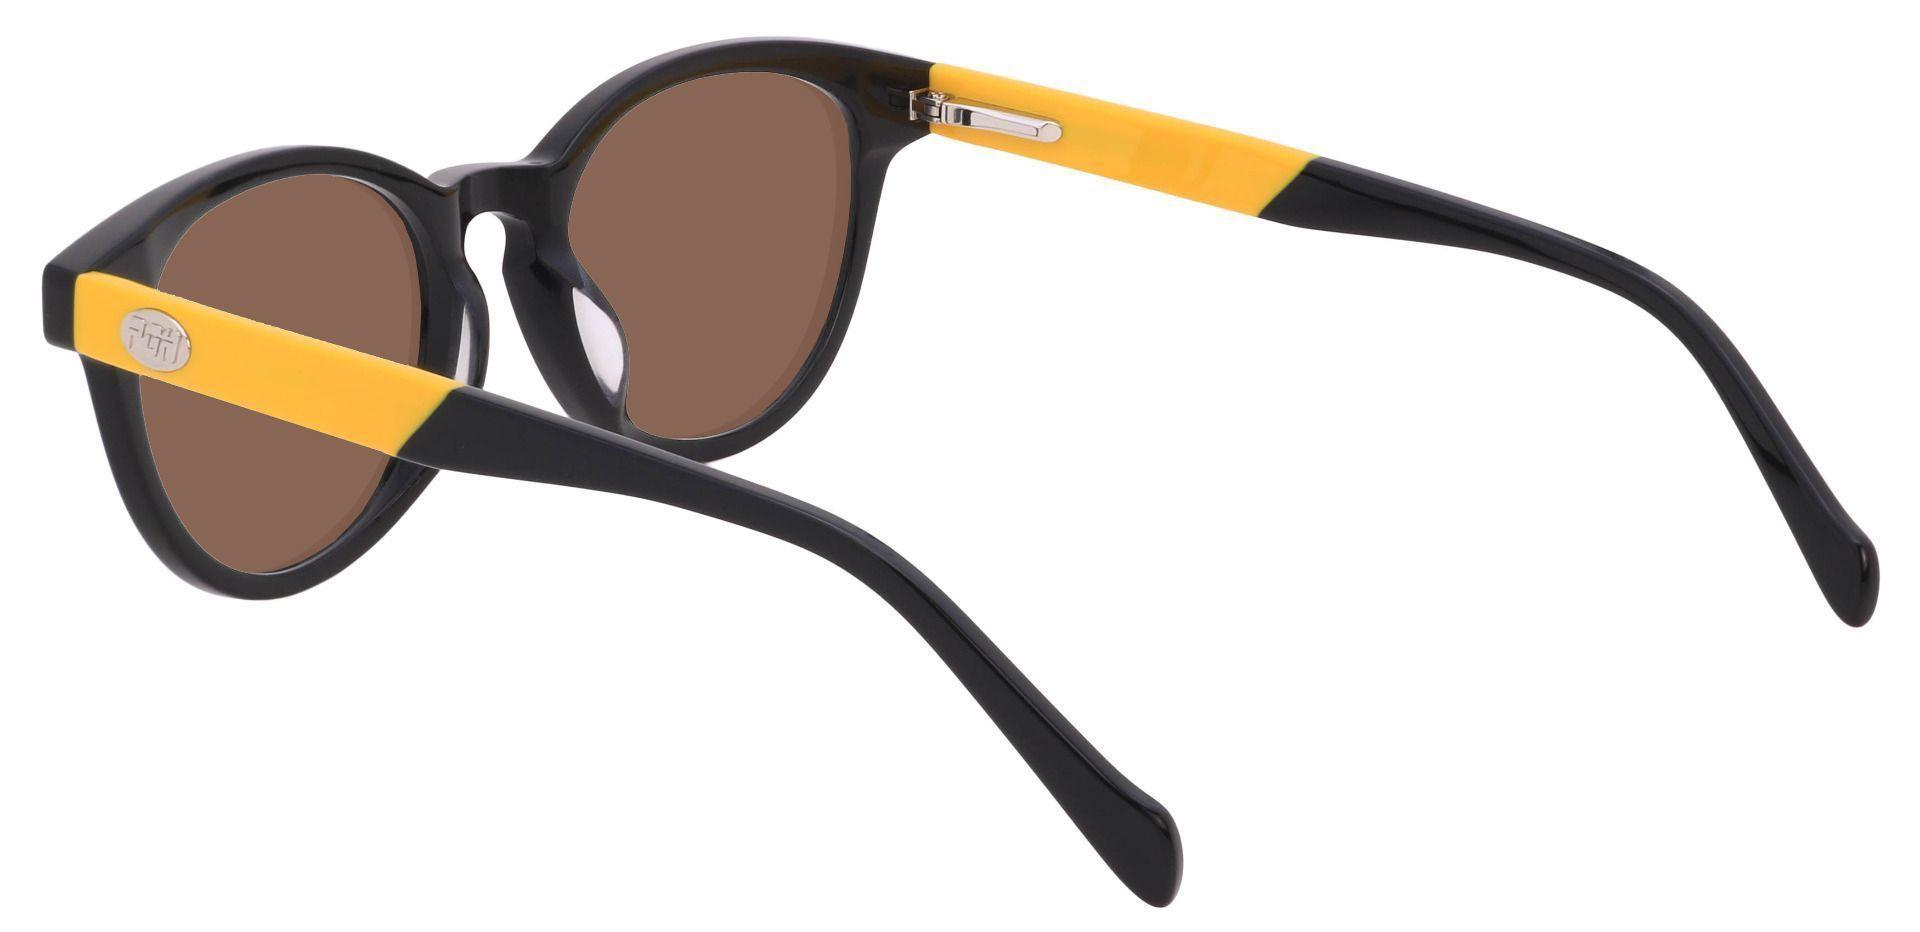 Oakland Oval Prescription Sunglasses - Black Frame With Brown Lenses